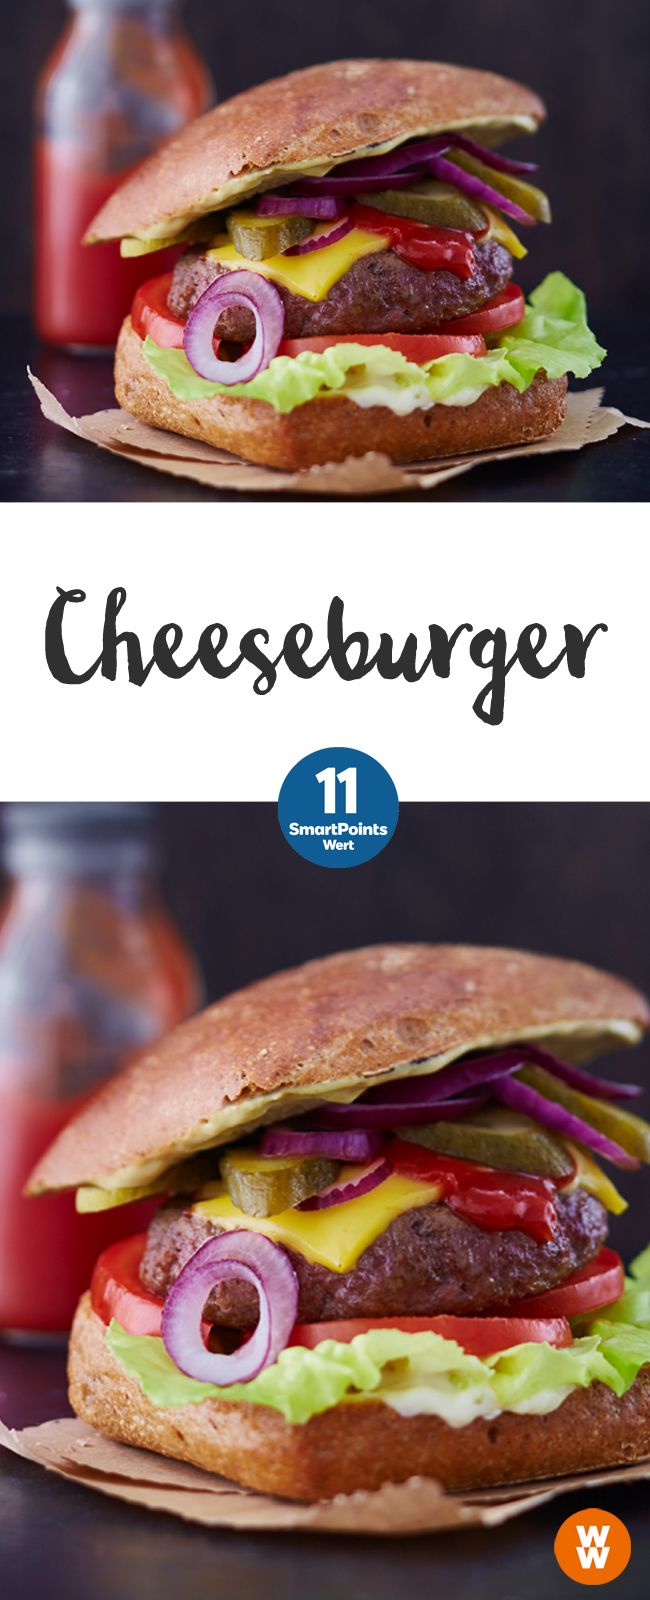 Cheeseburger, Burger, Grillen, Barbecue   Weight Watchers